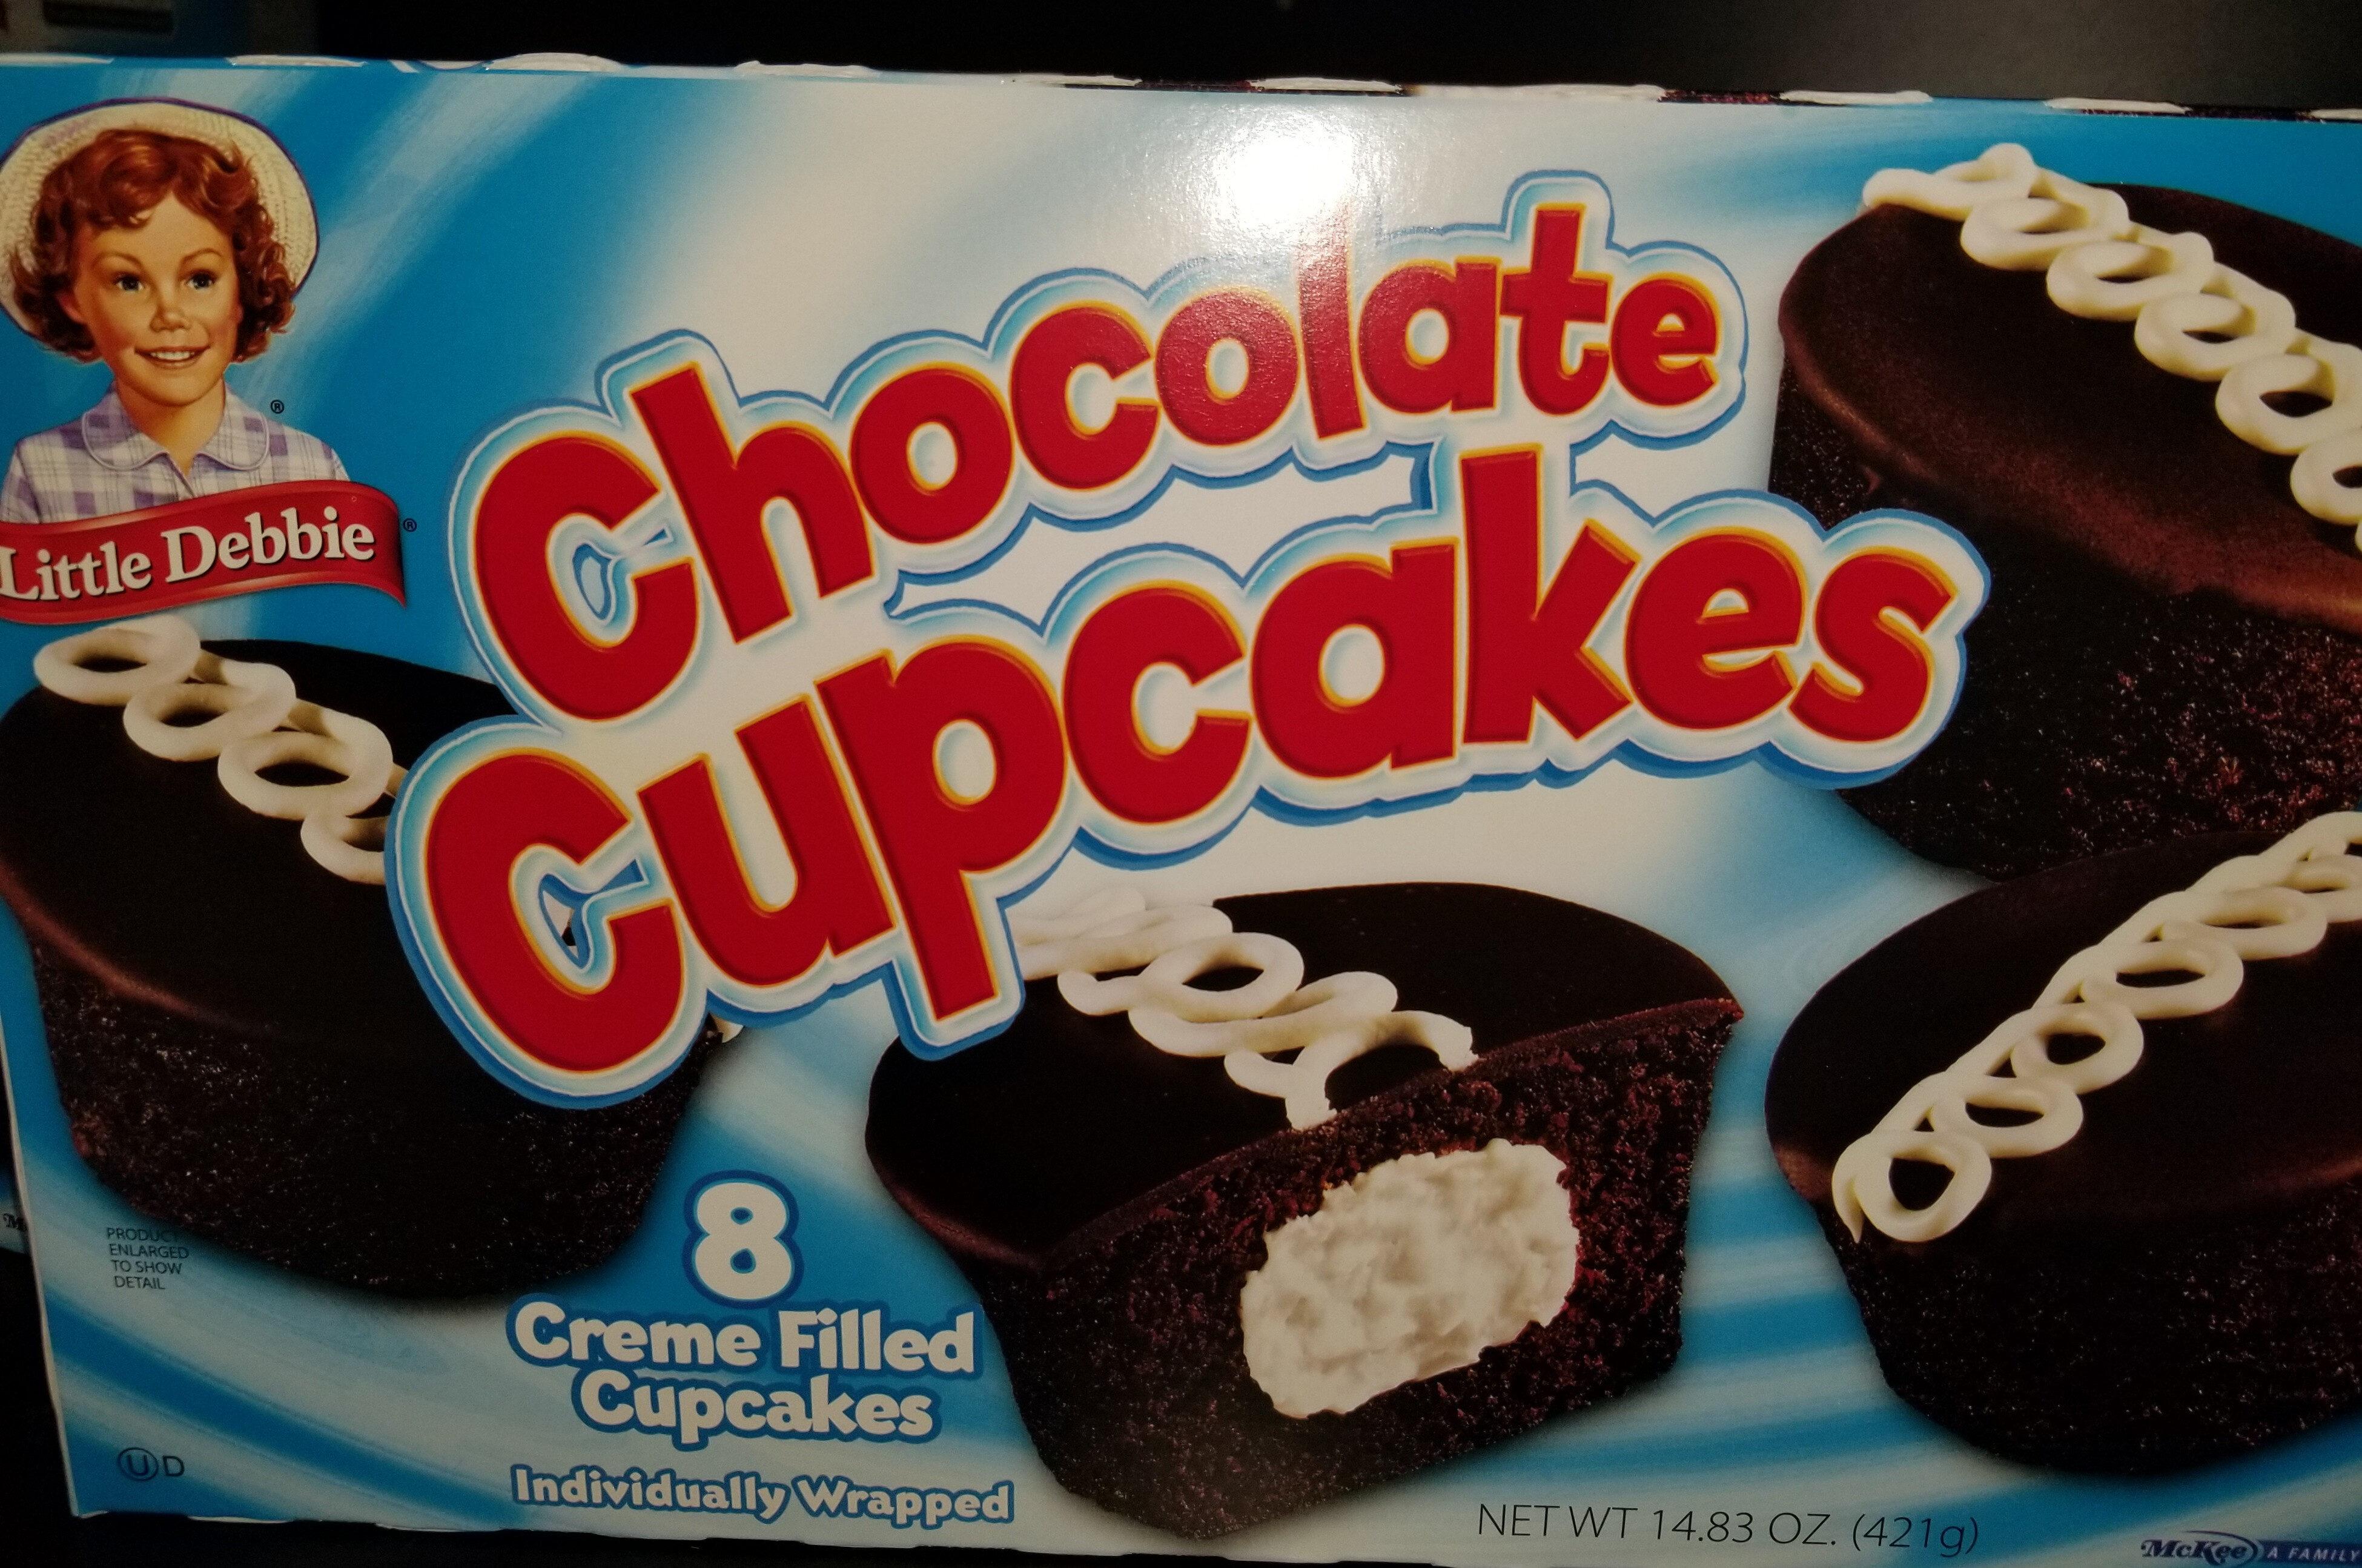 Creme filled cupcakes - Produit - en